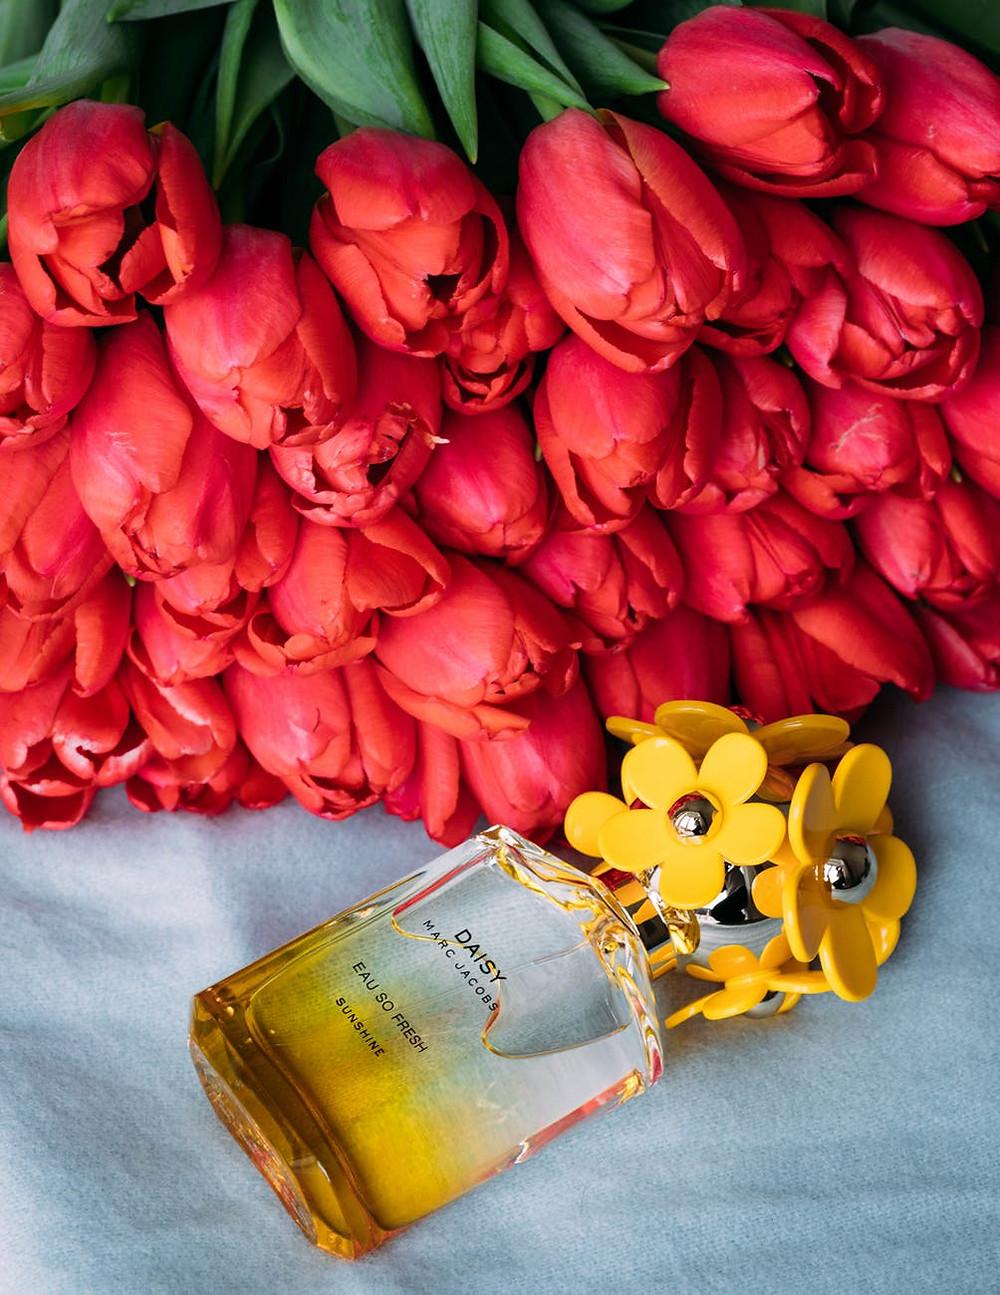 perfumes florales fragancia flores parfum buenos olores belleza beauty tendencias girly